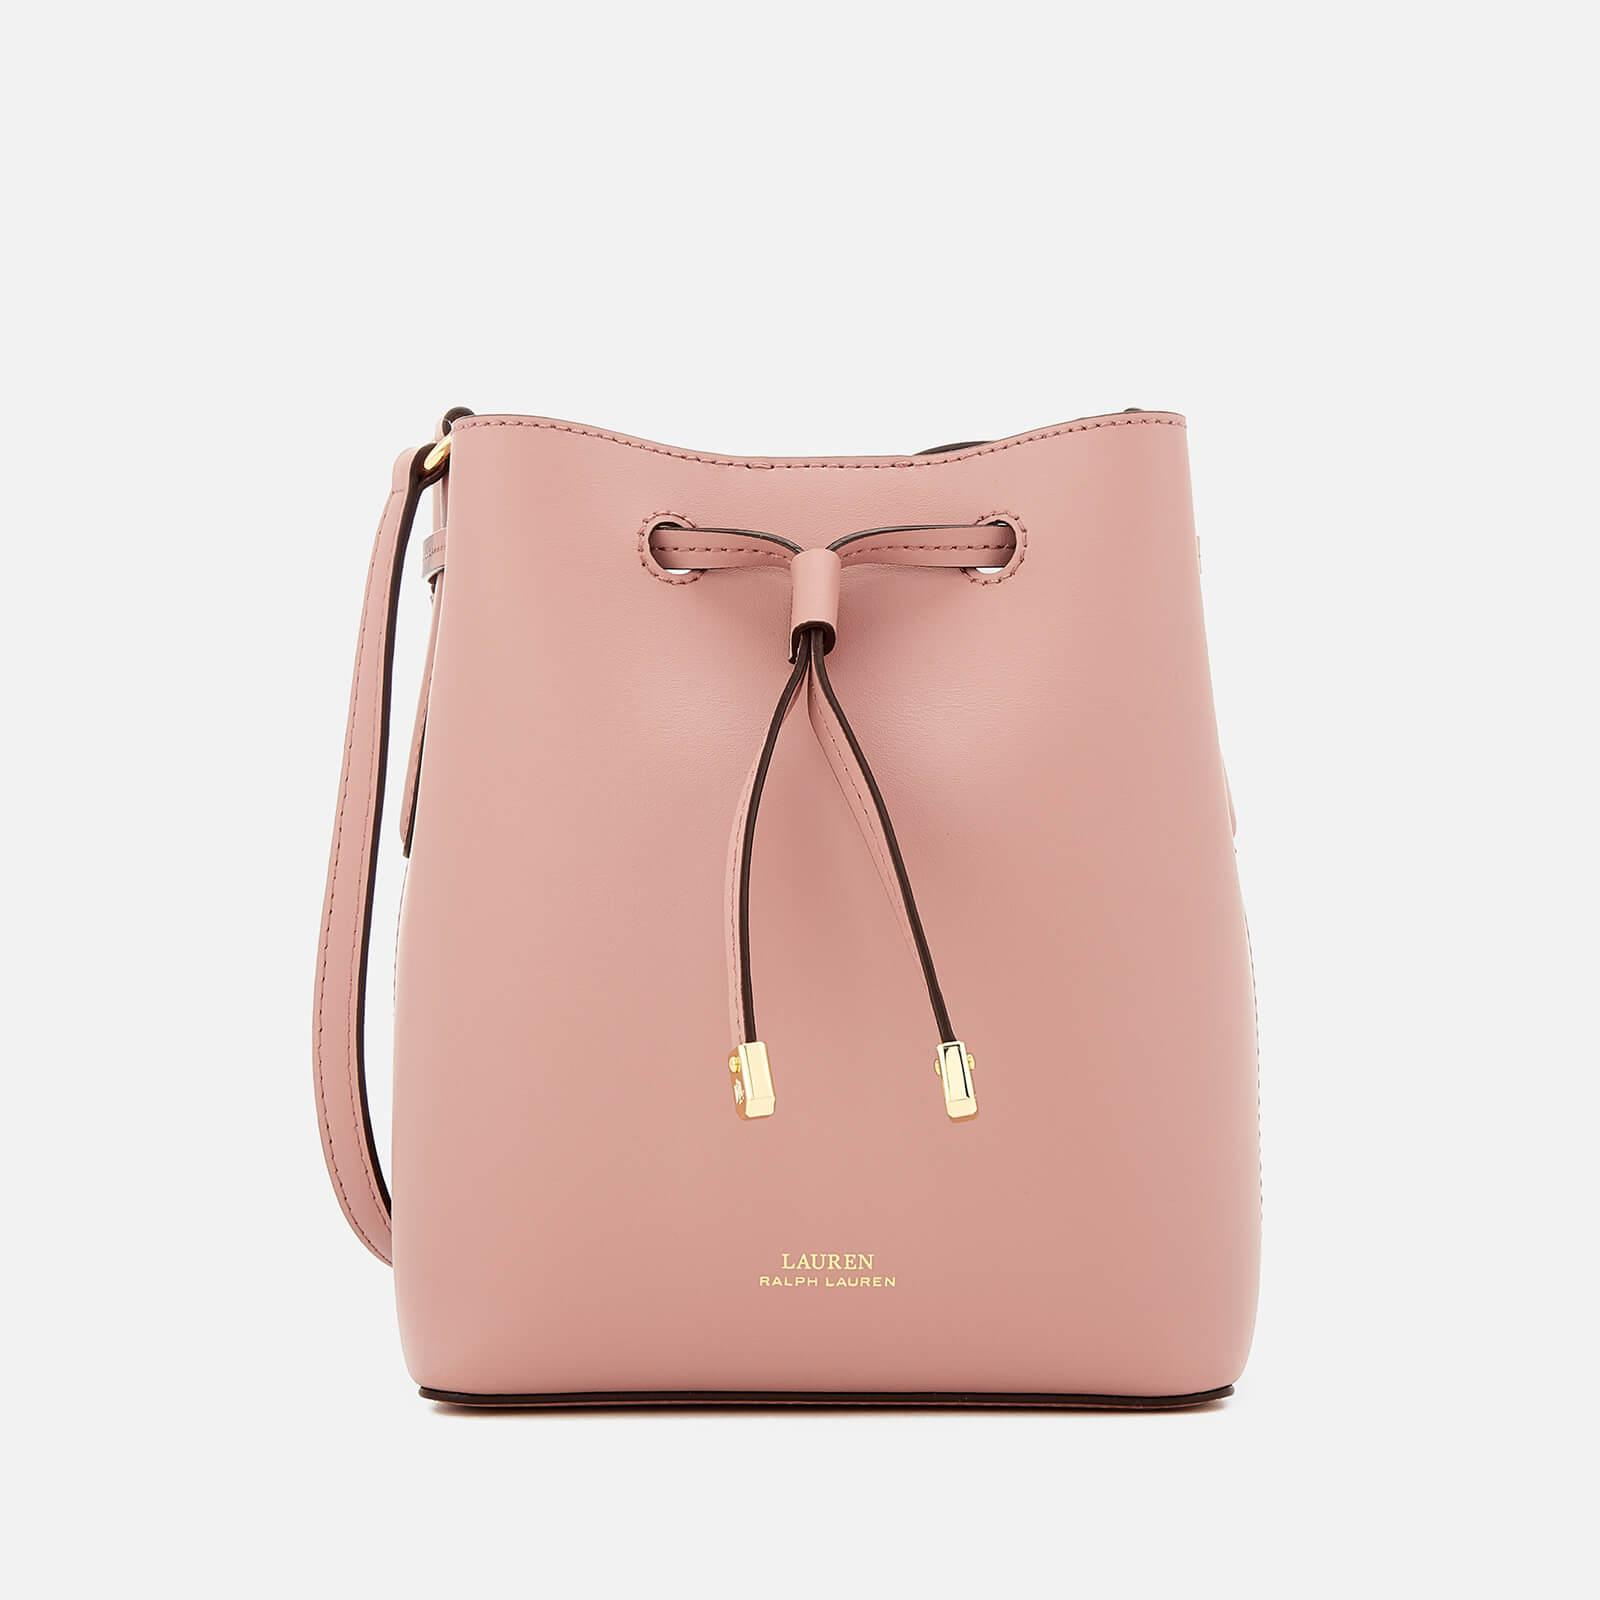 Lauren by Ralph Lauren Dryden Debby Mini Drawstring Bag in Pink - Lyst d6d7402b438d5